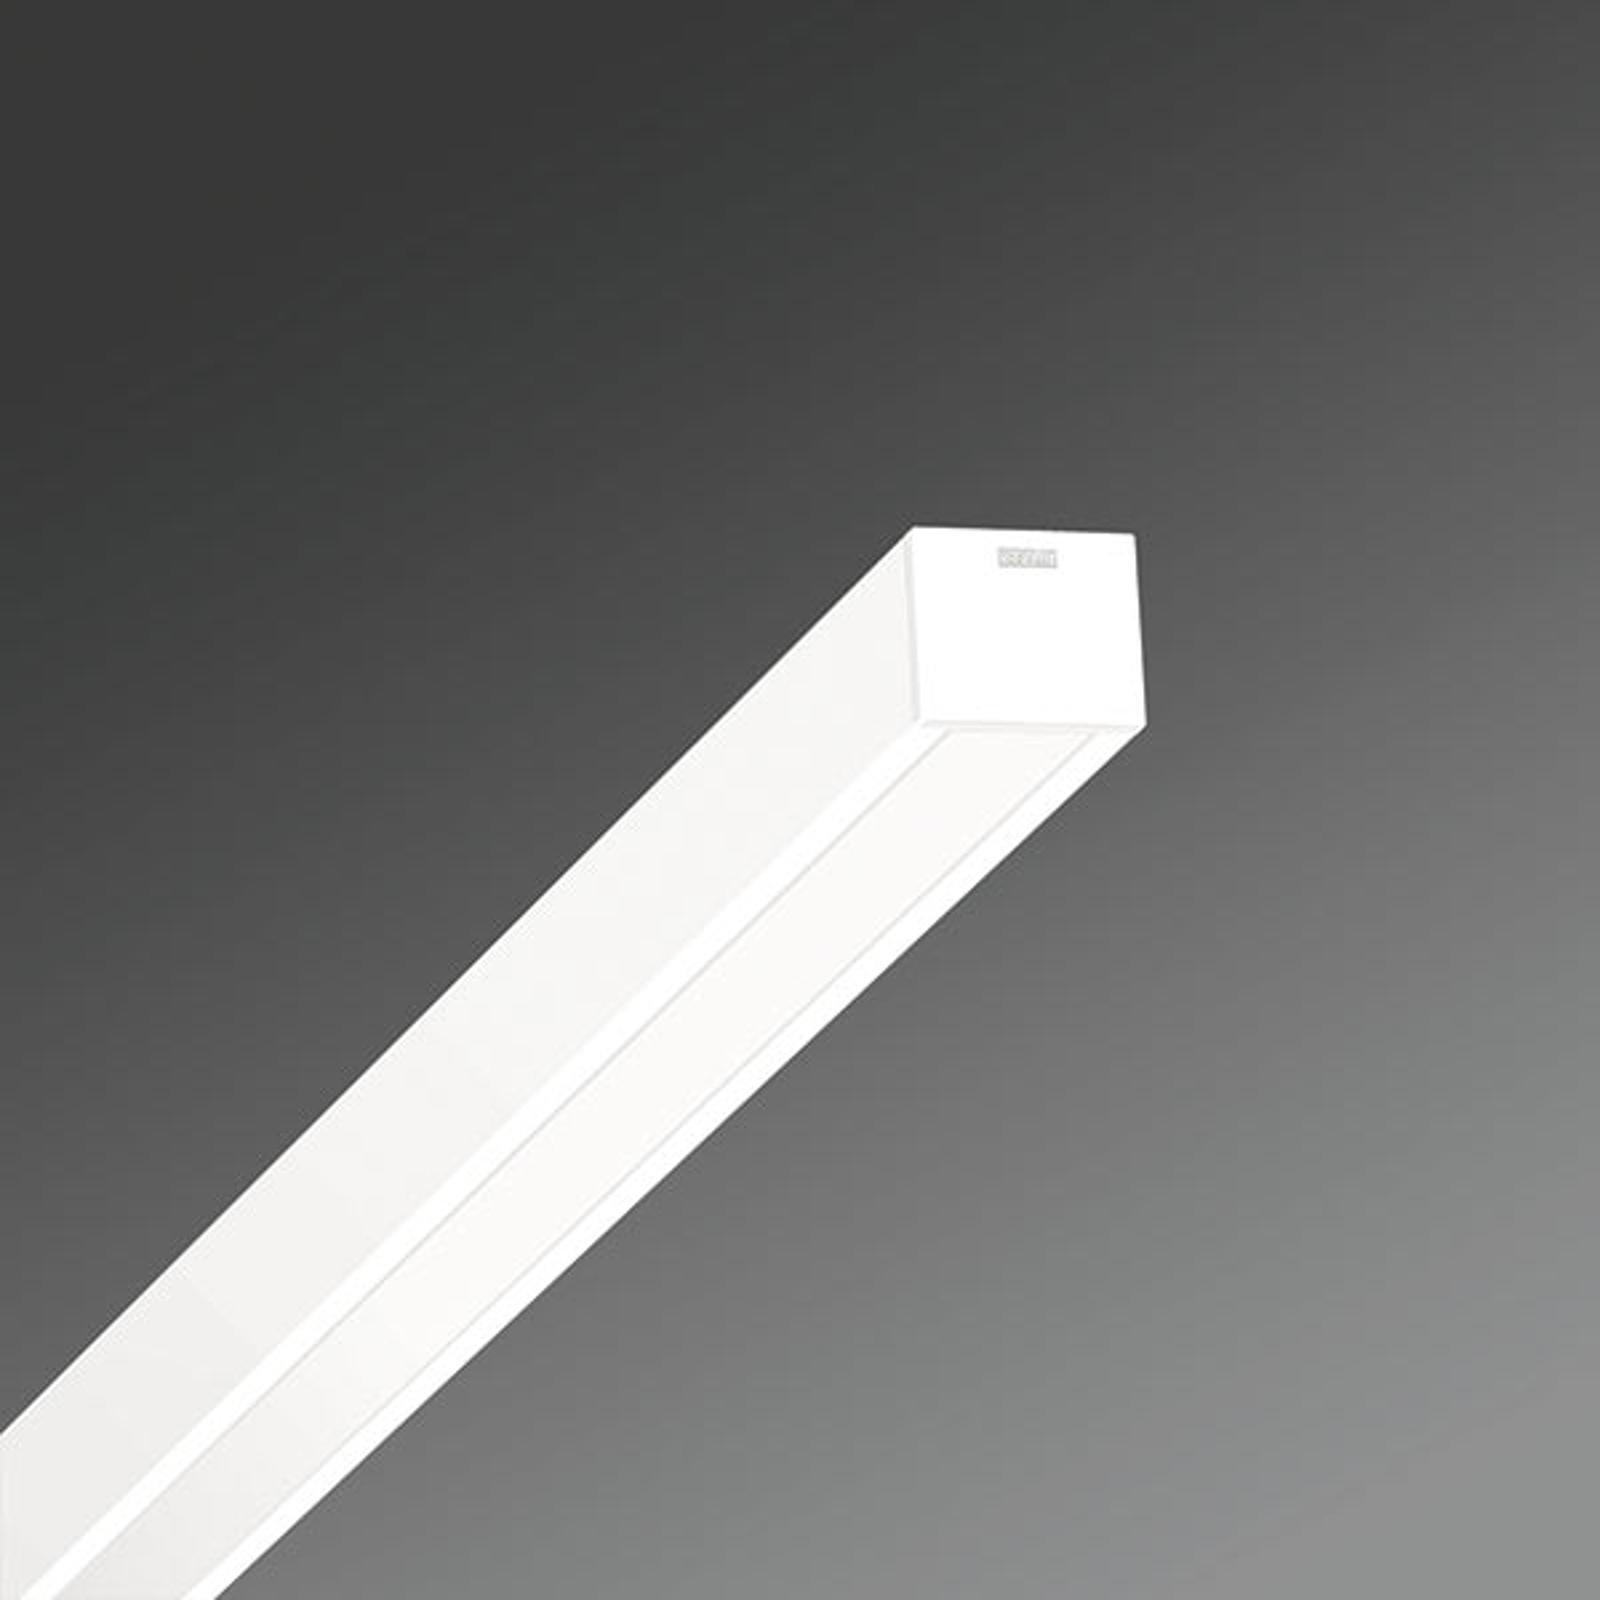 Lampa sufitowa kanałowa Hokal-HLAG/1200 LED 23W